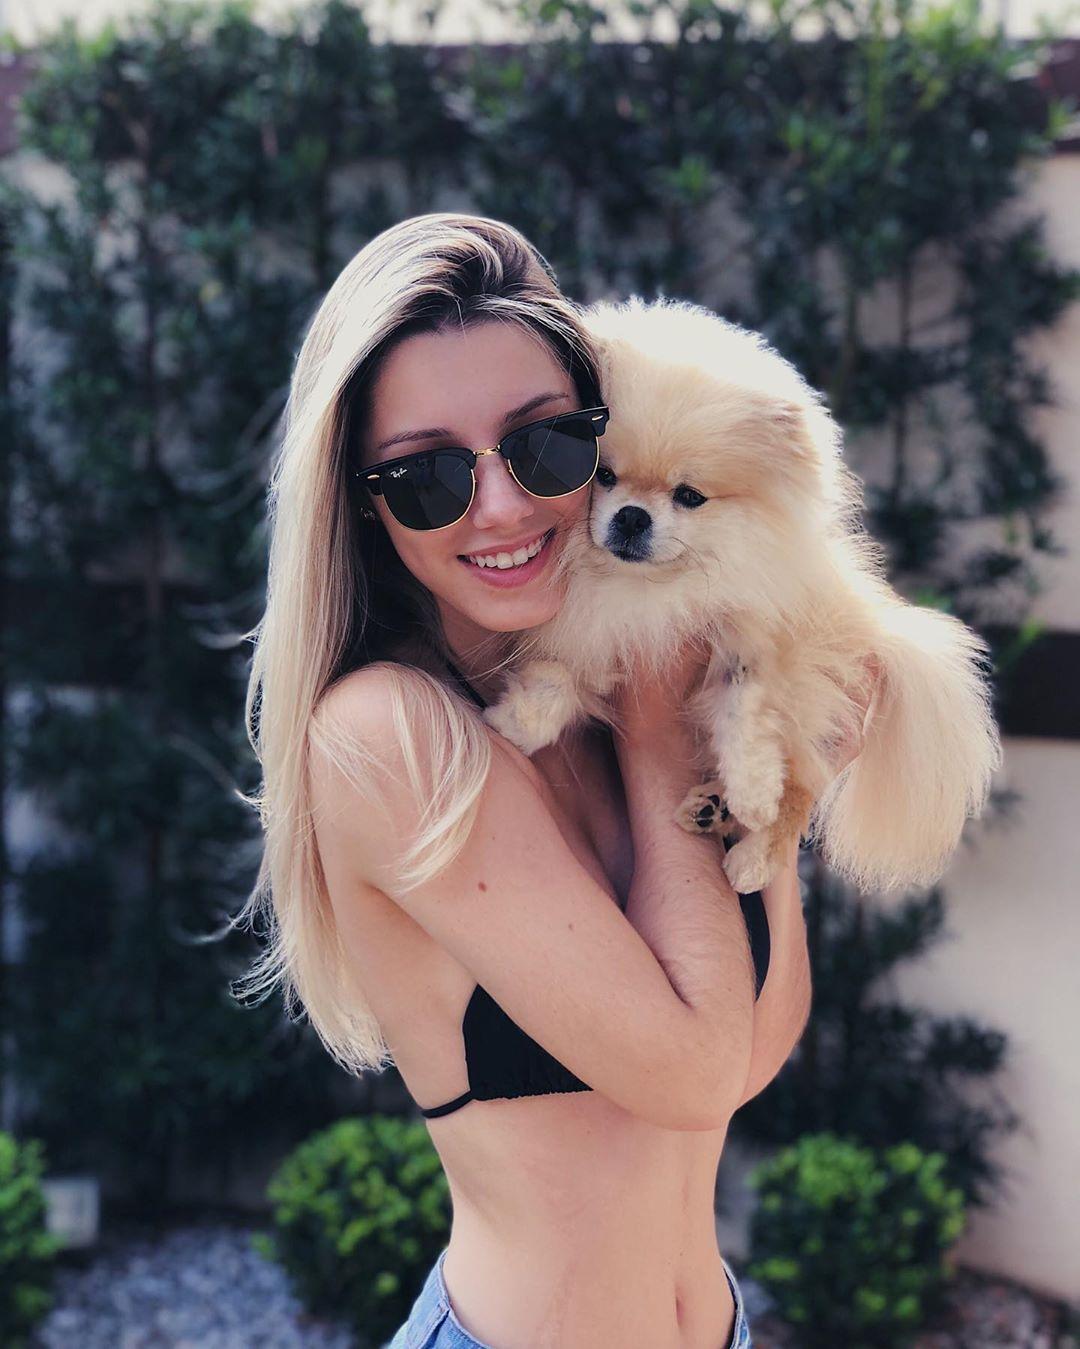 isabela stella, candidata a miss parana 2020, miss arapongas 2017/2019. 94248610